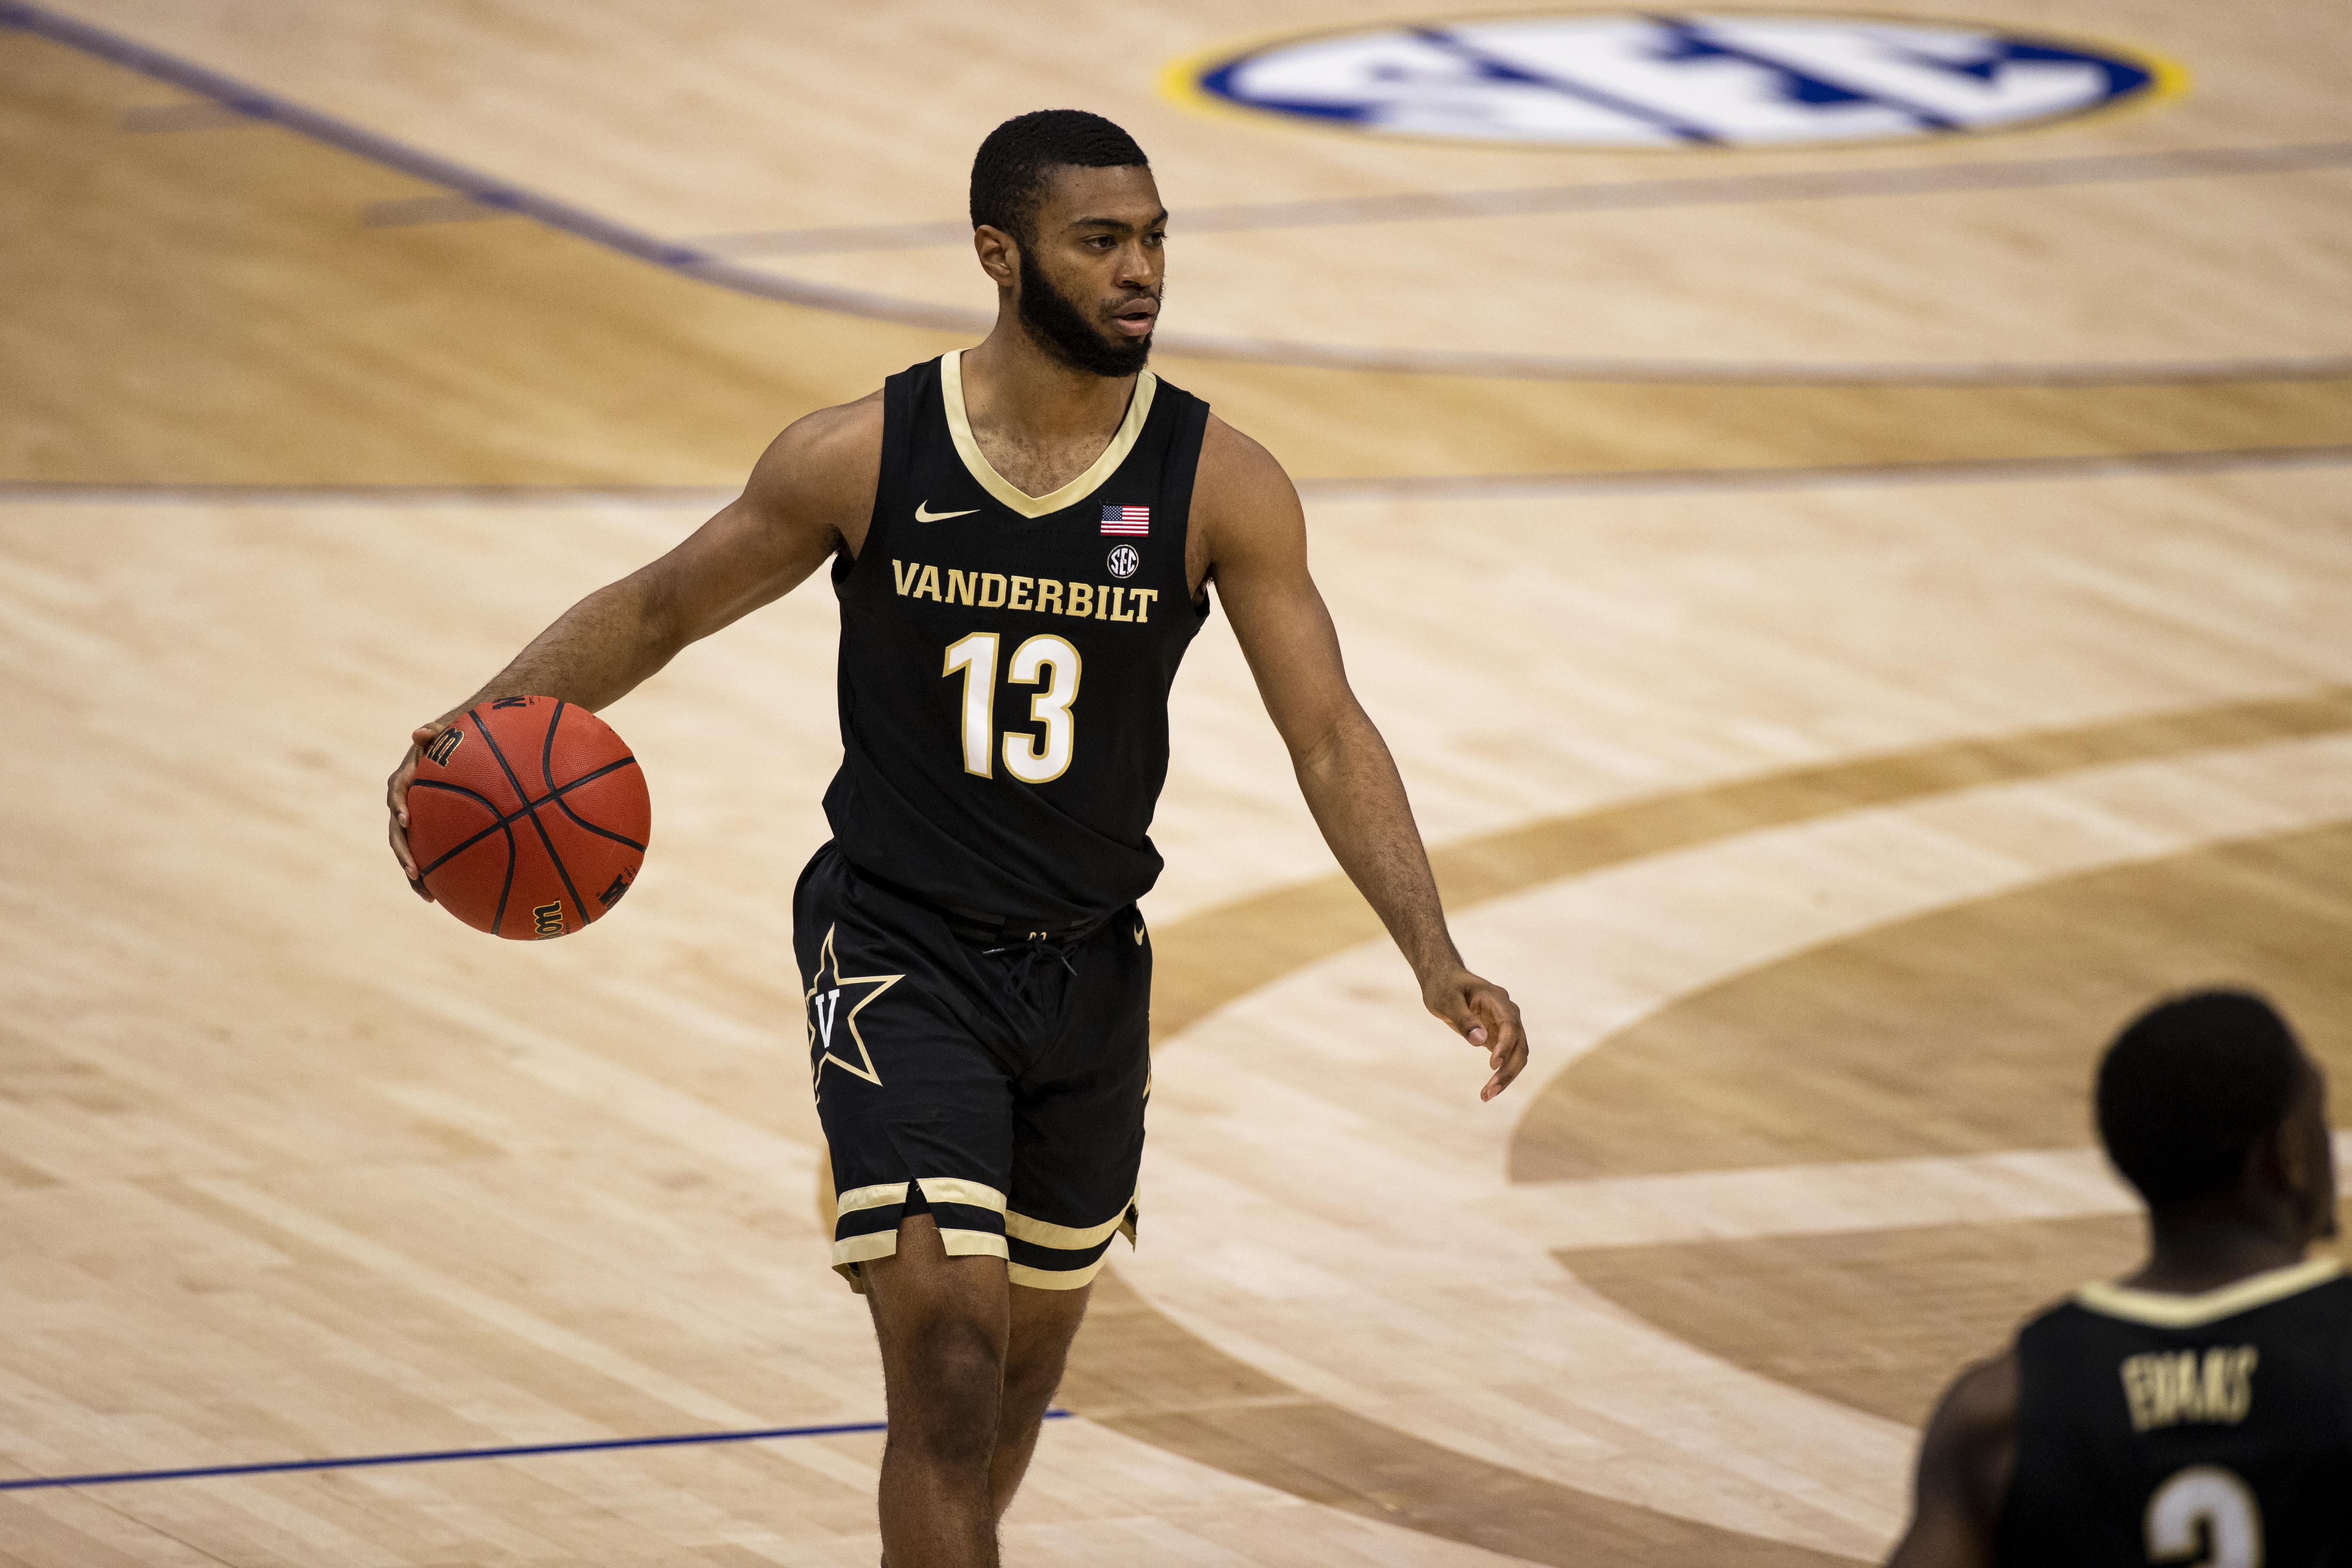 SEC Men's Basketball Tournament - Florida v Vanderbilt